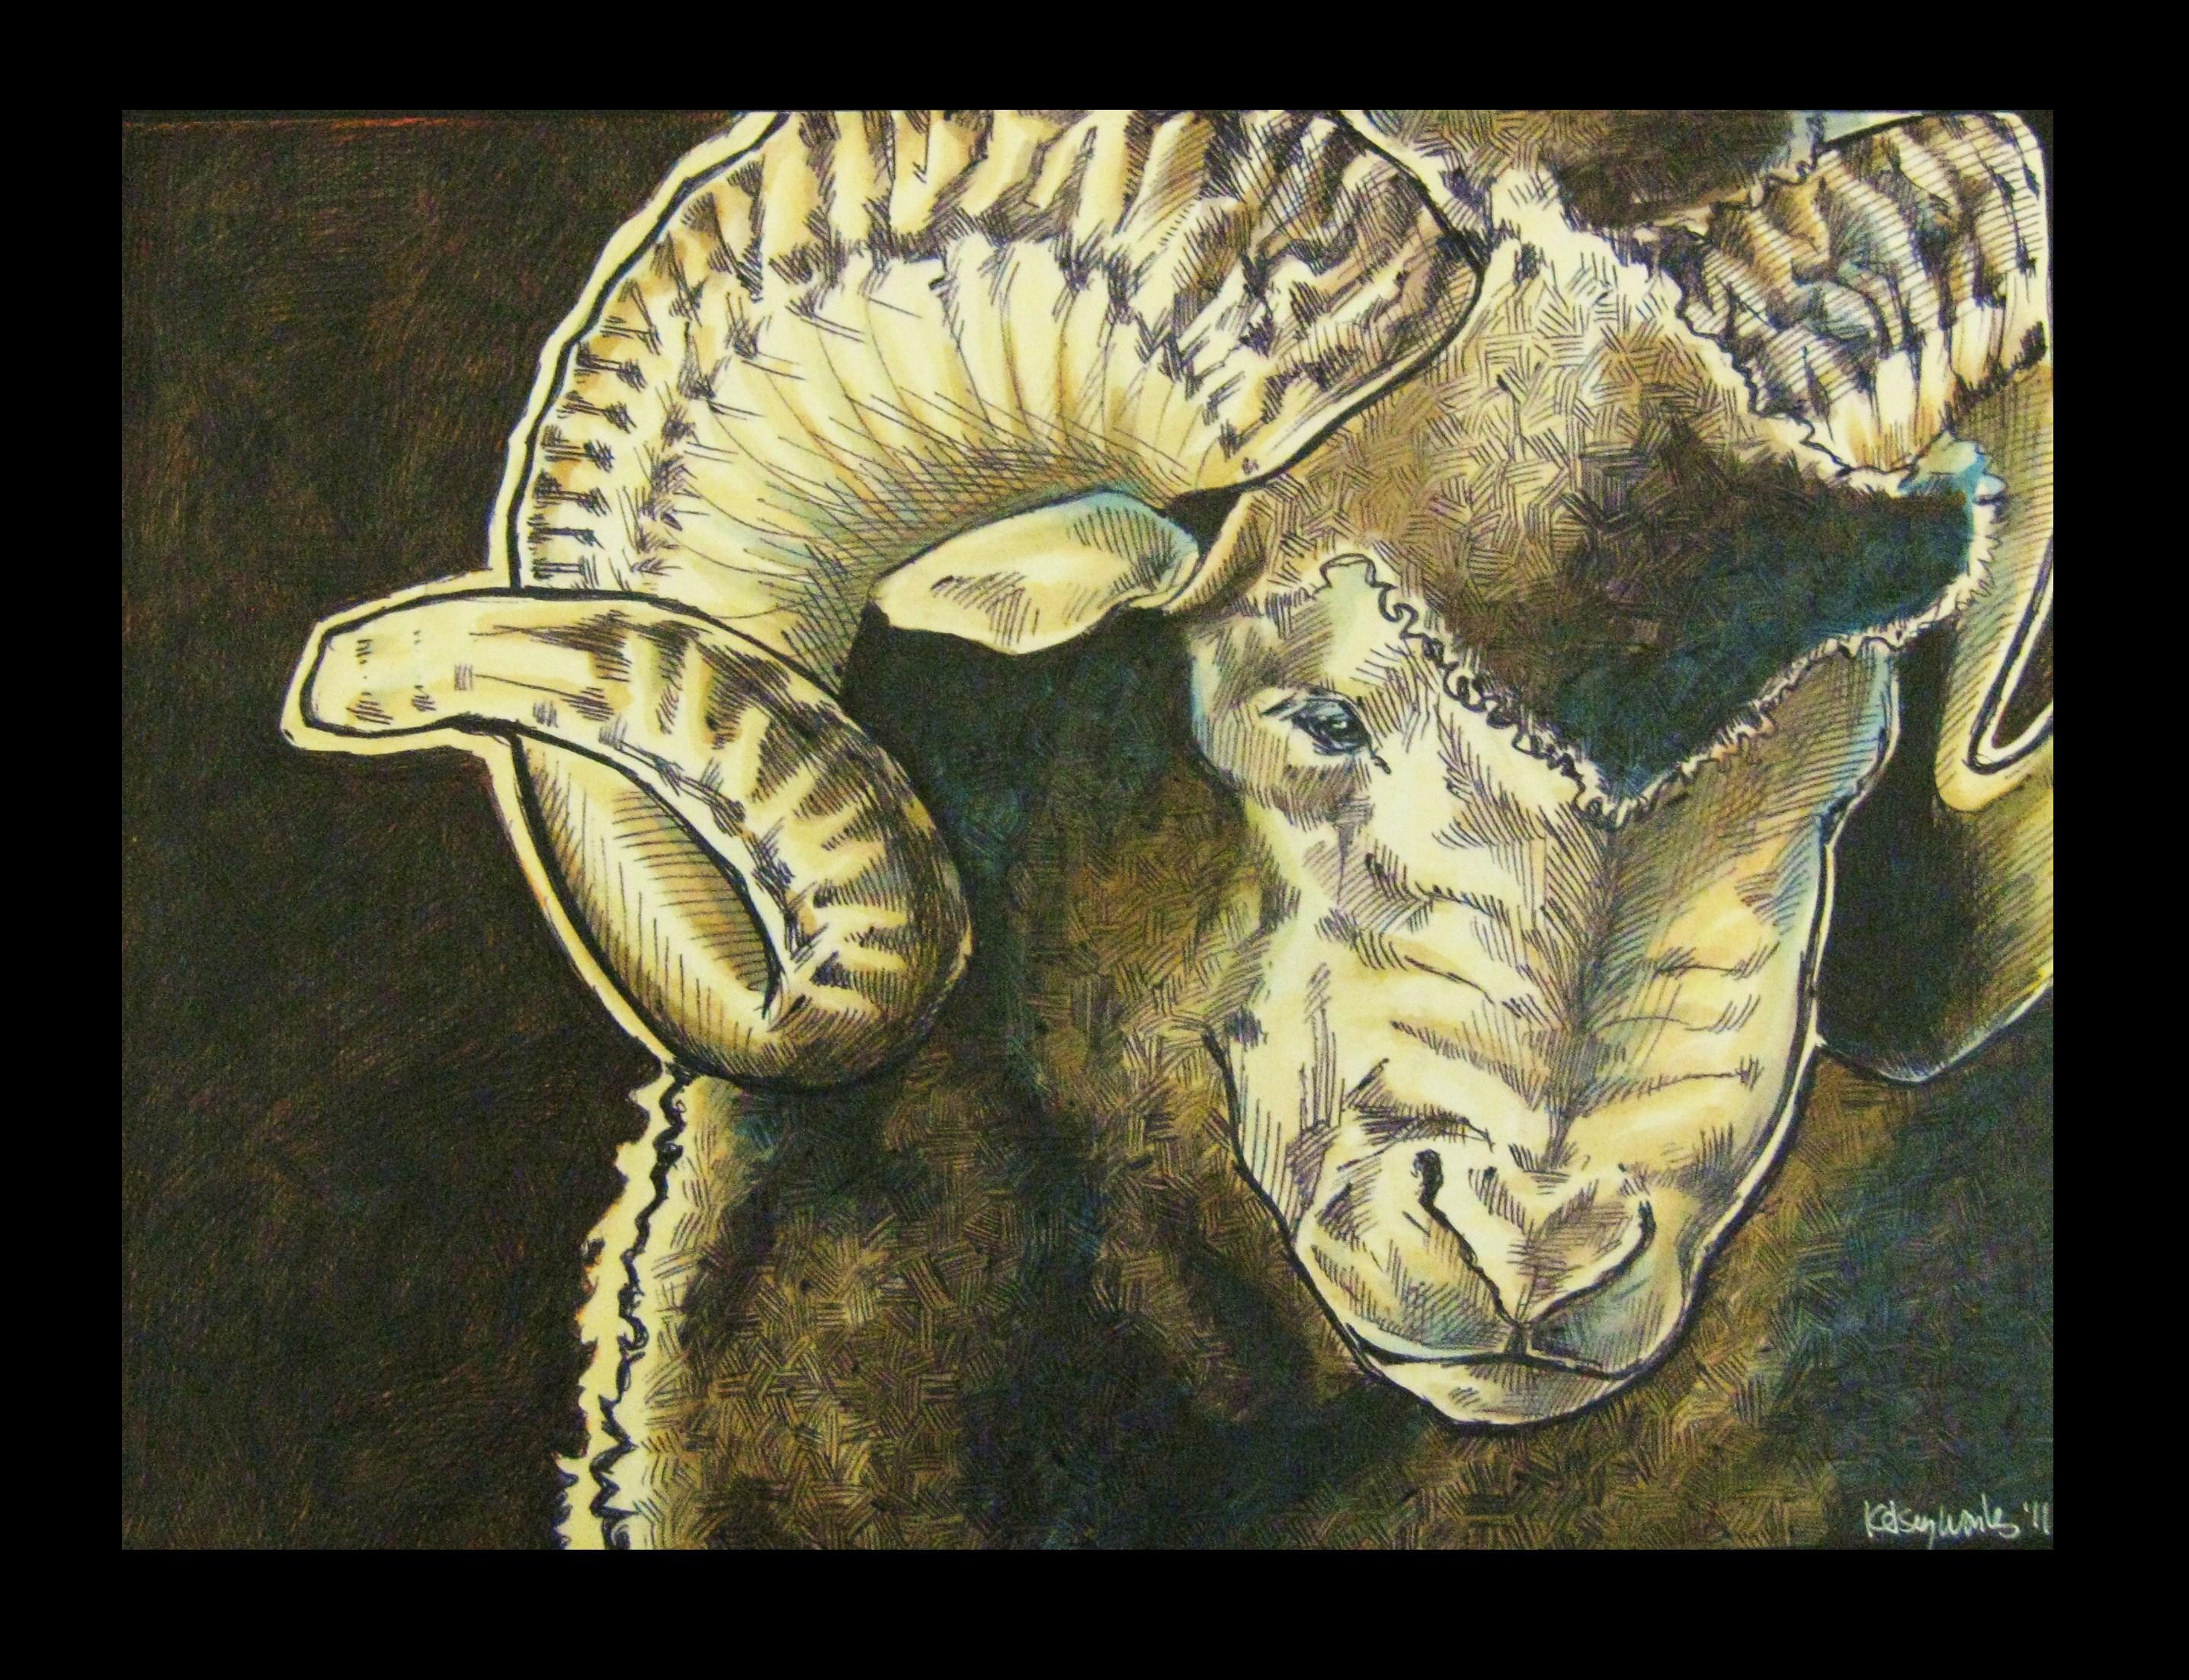 Merino ram by EatToast